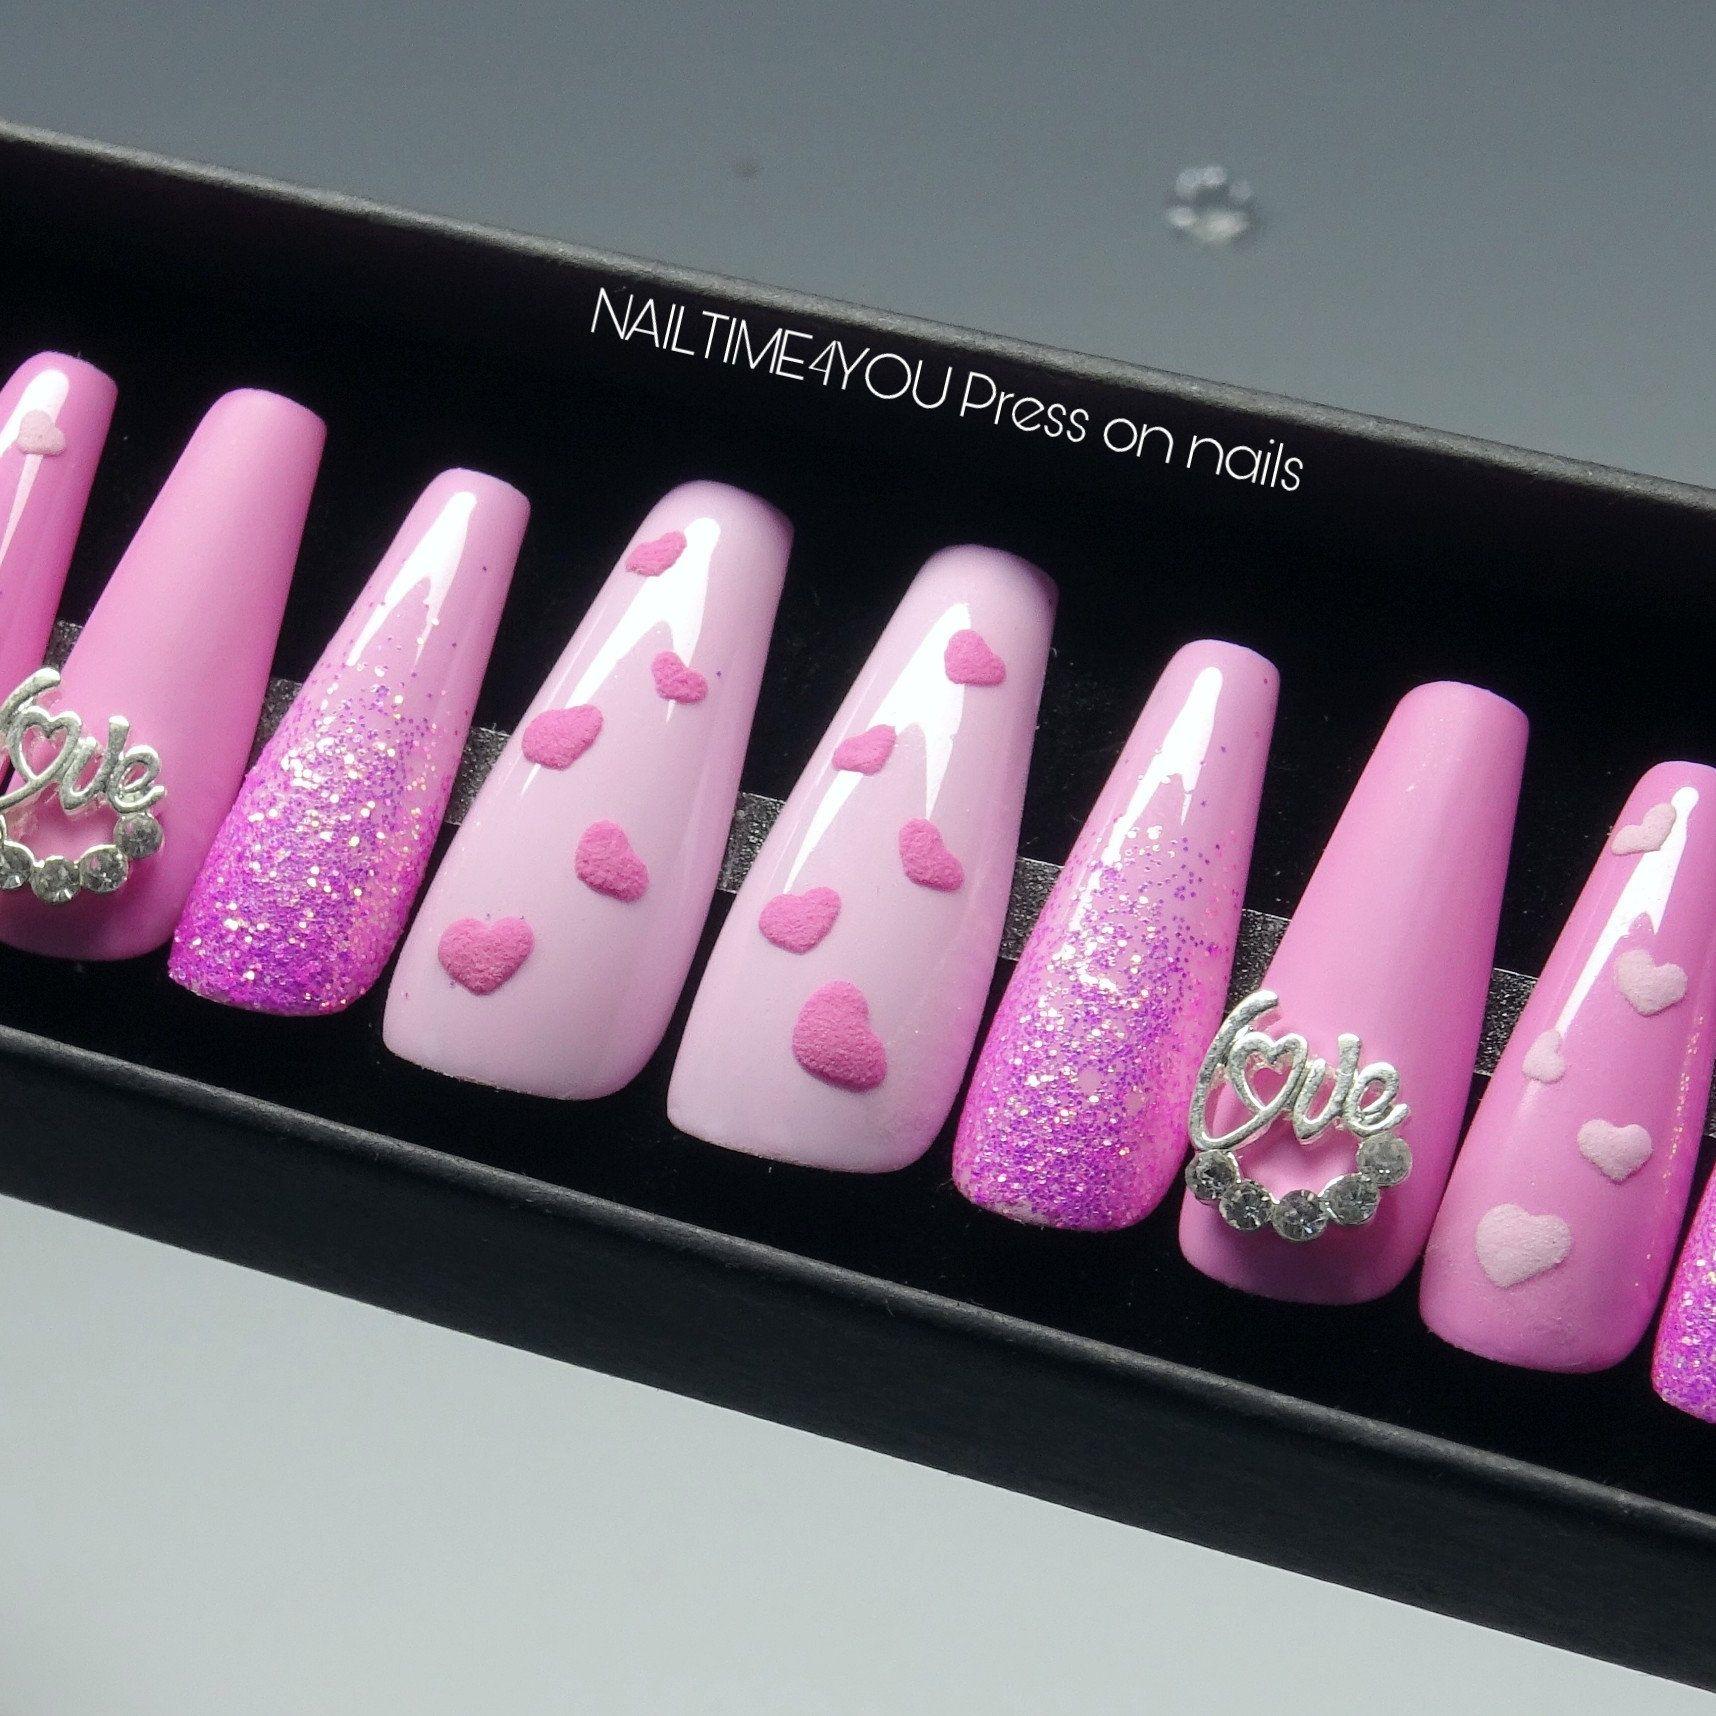 Valentines Press On Nails Pink Love Nails Glue On Nails Etsy Press On Nails Glue On Nails Pink Nails